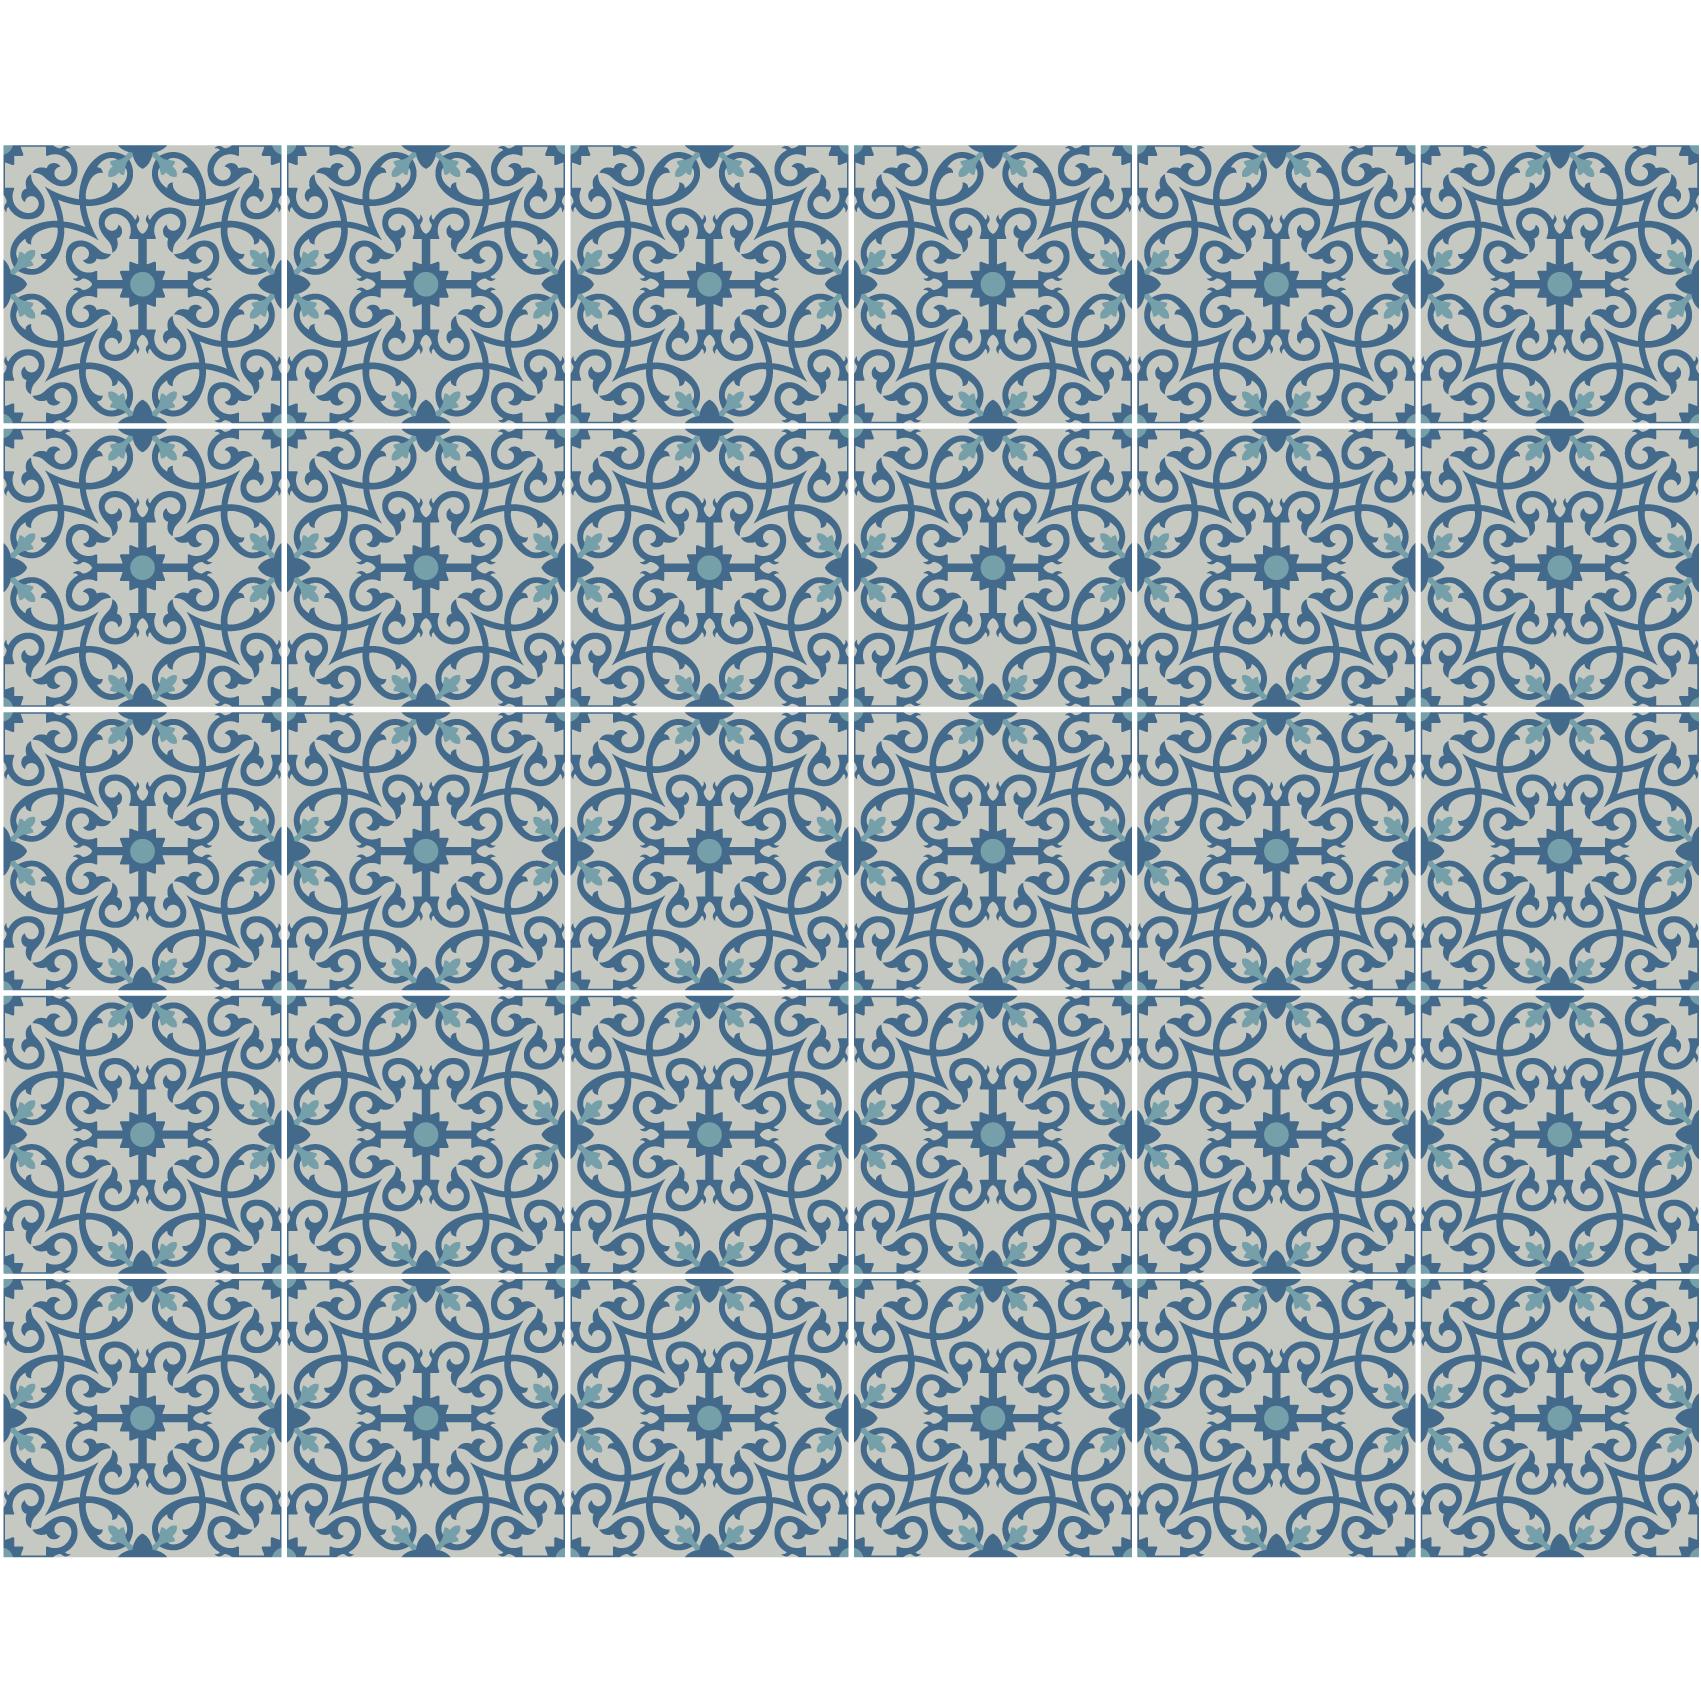 30 stickers carreaux de ciment azulejos dinis cuisine. Black Bedroom Furniture Sets. Home Design Ideas